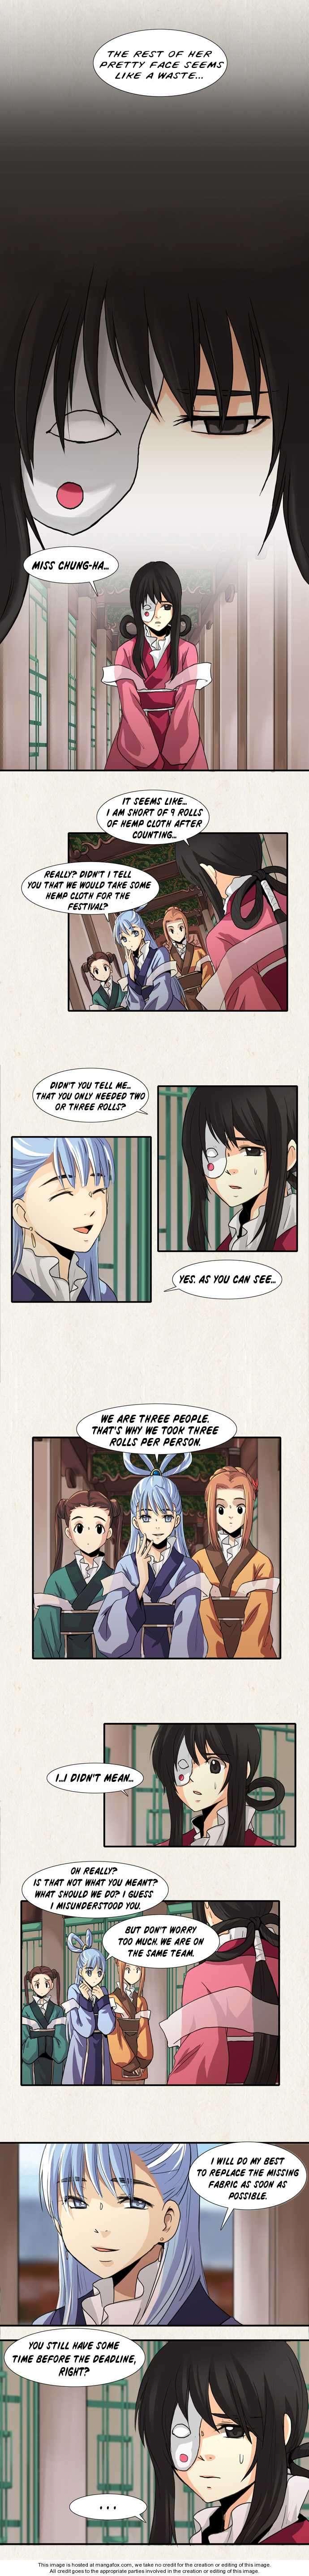 Gyon Woo Jik Nyu 3 Page 2